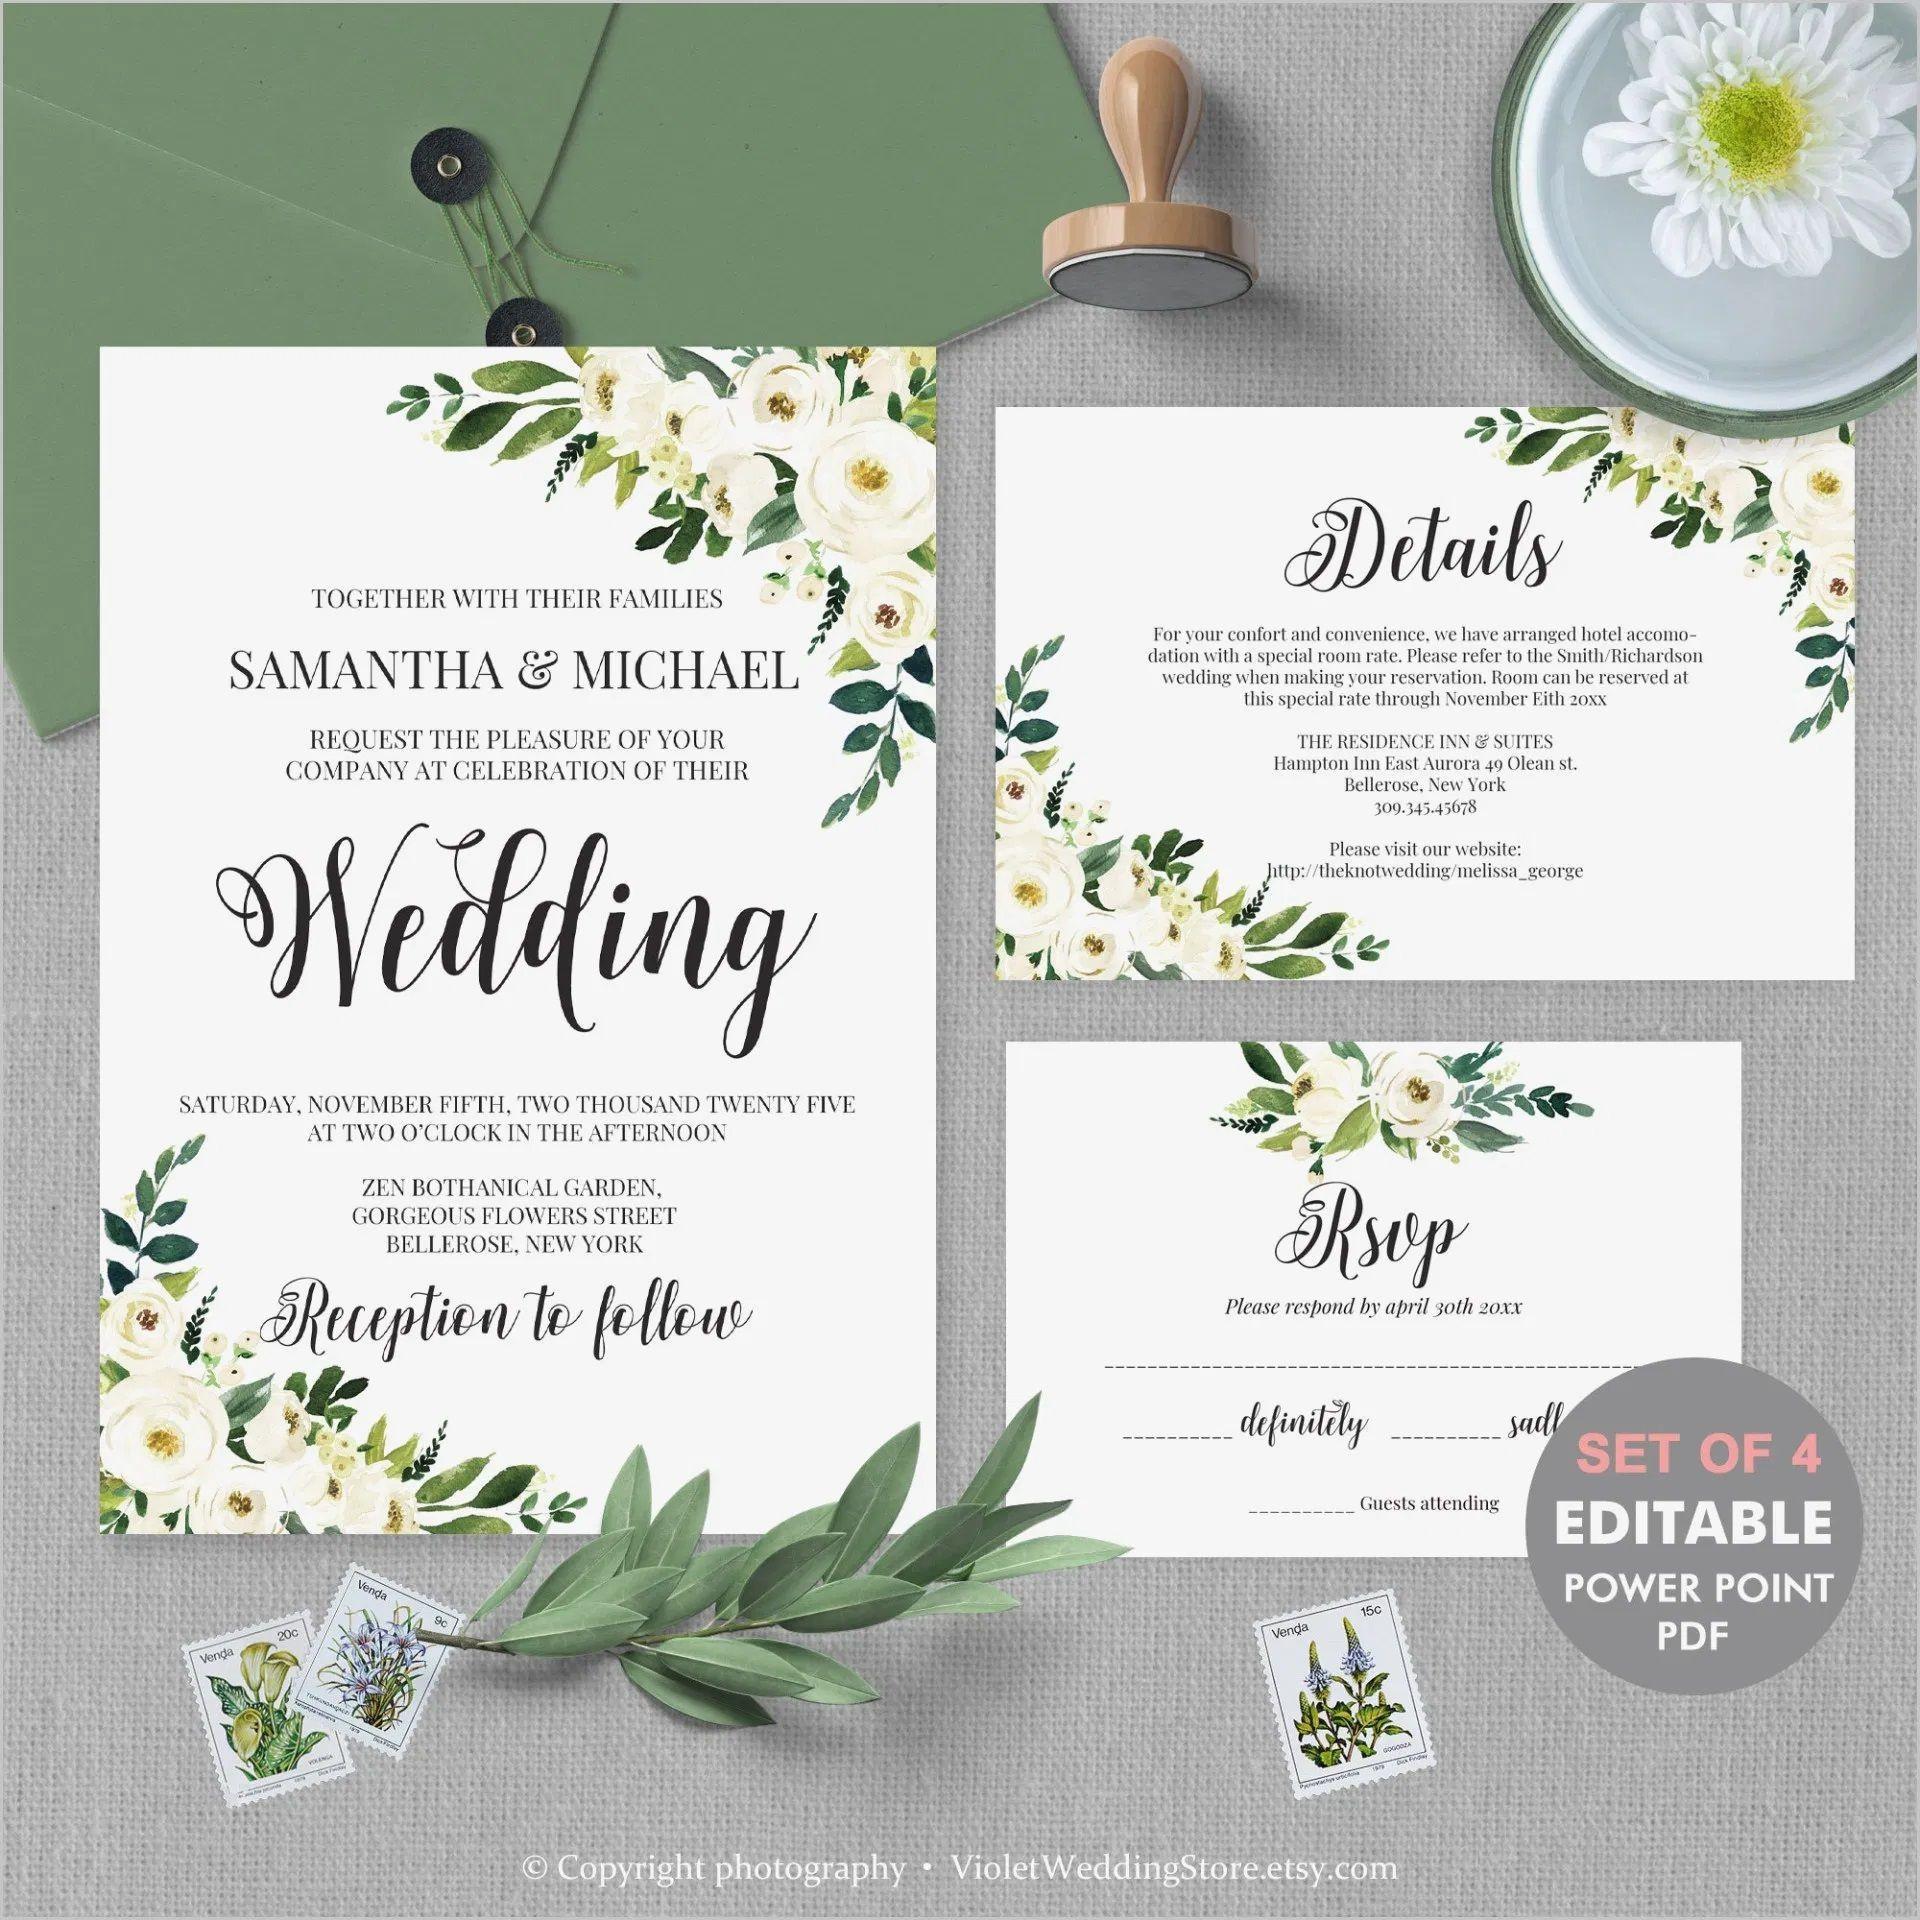 Editable Wedding Invitation Templates Addictionary